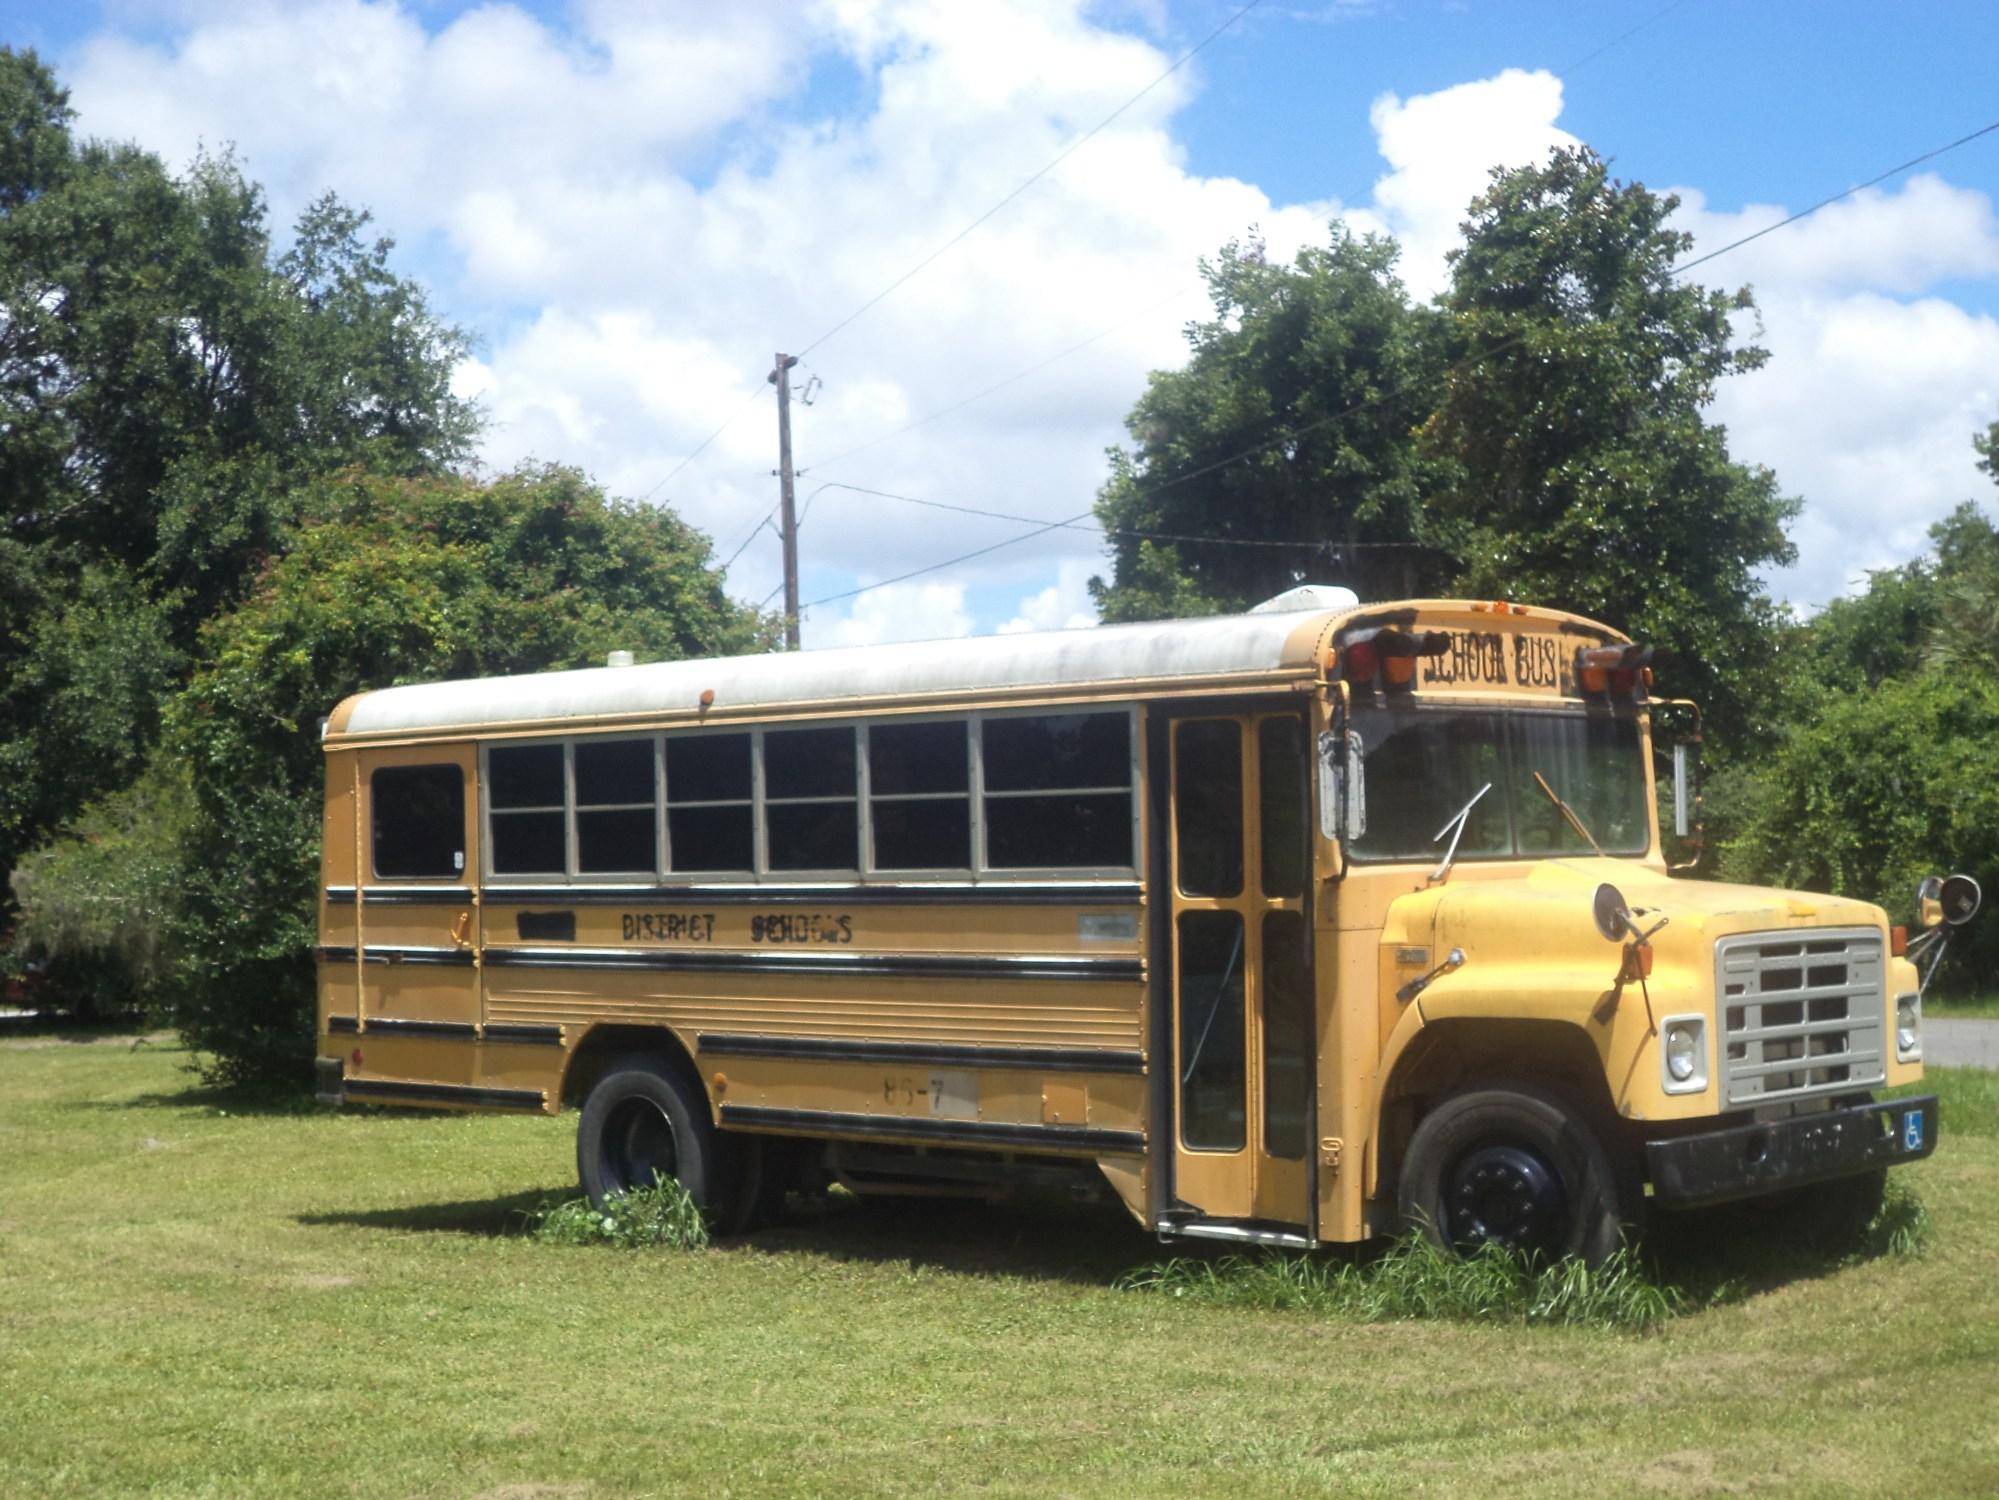 hight resolution of old school bus nahunta jpg